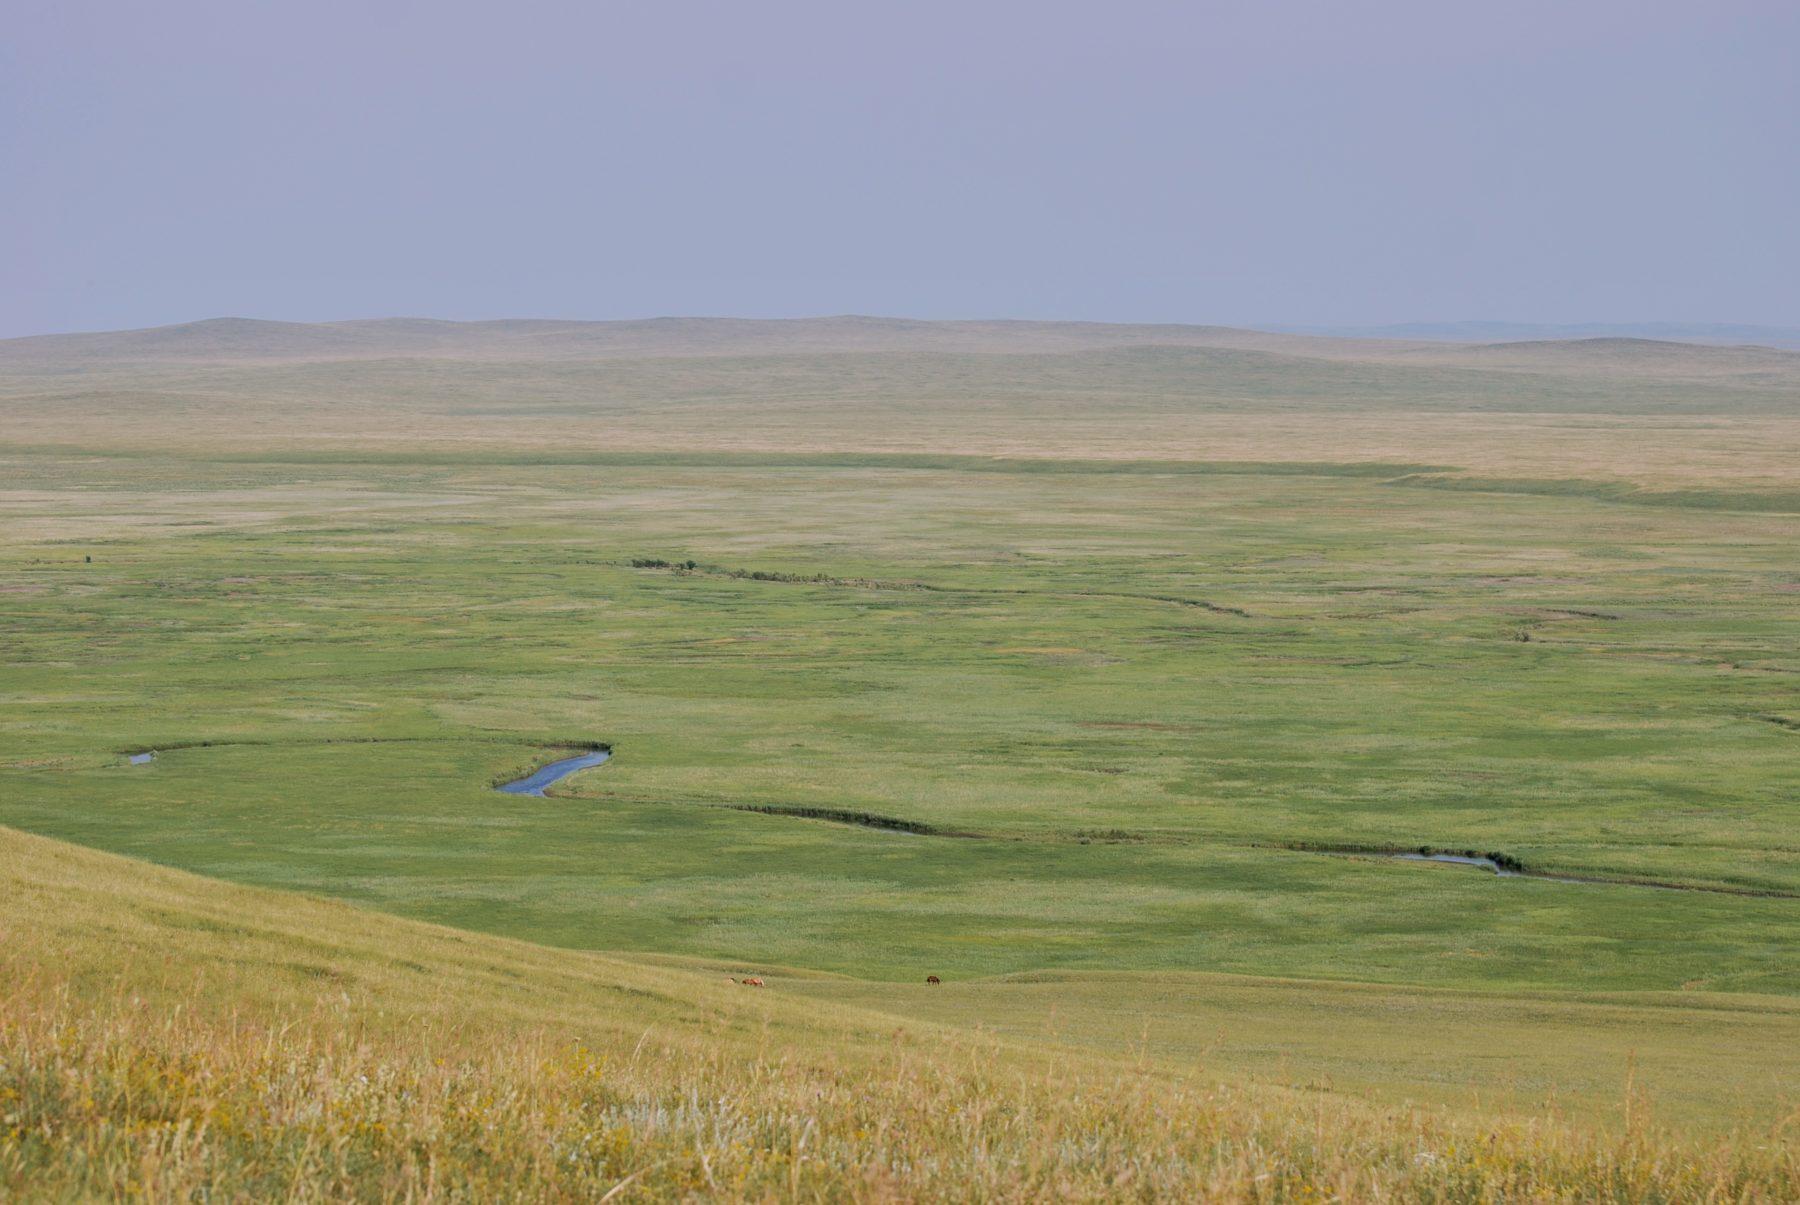 https://www.thethirdpole.net/content/uploads/2021/06/Landscapes-of-Dauria-Blue-Horse-5-scaled.jpg